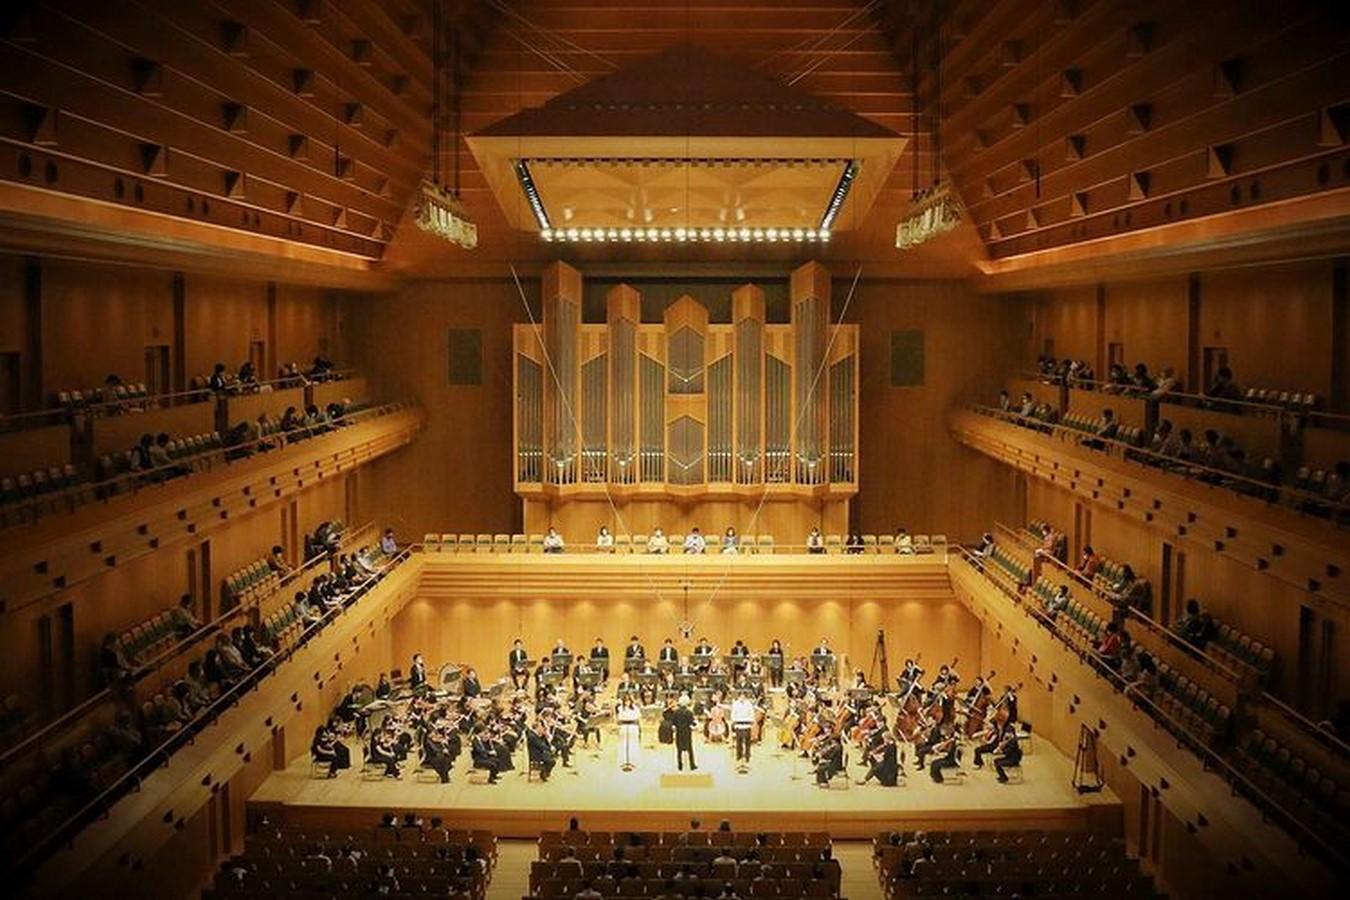 Tokyo Opera City Concert Hall by Takahiko Yanagisawa: The Perfect Pitch - Sheet6